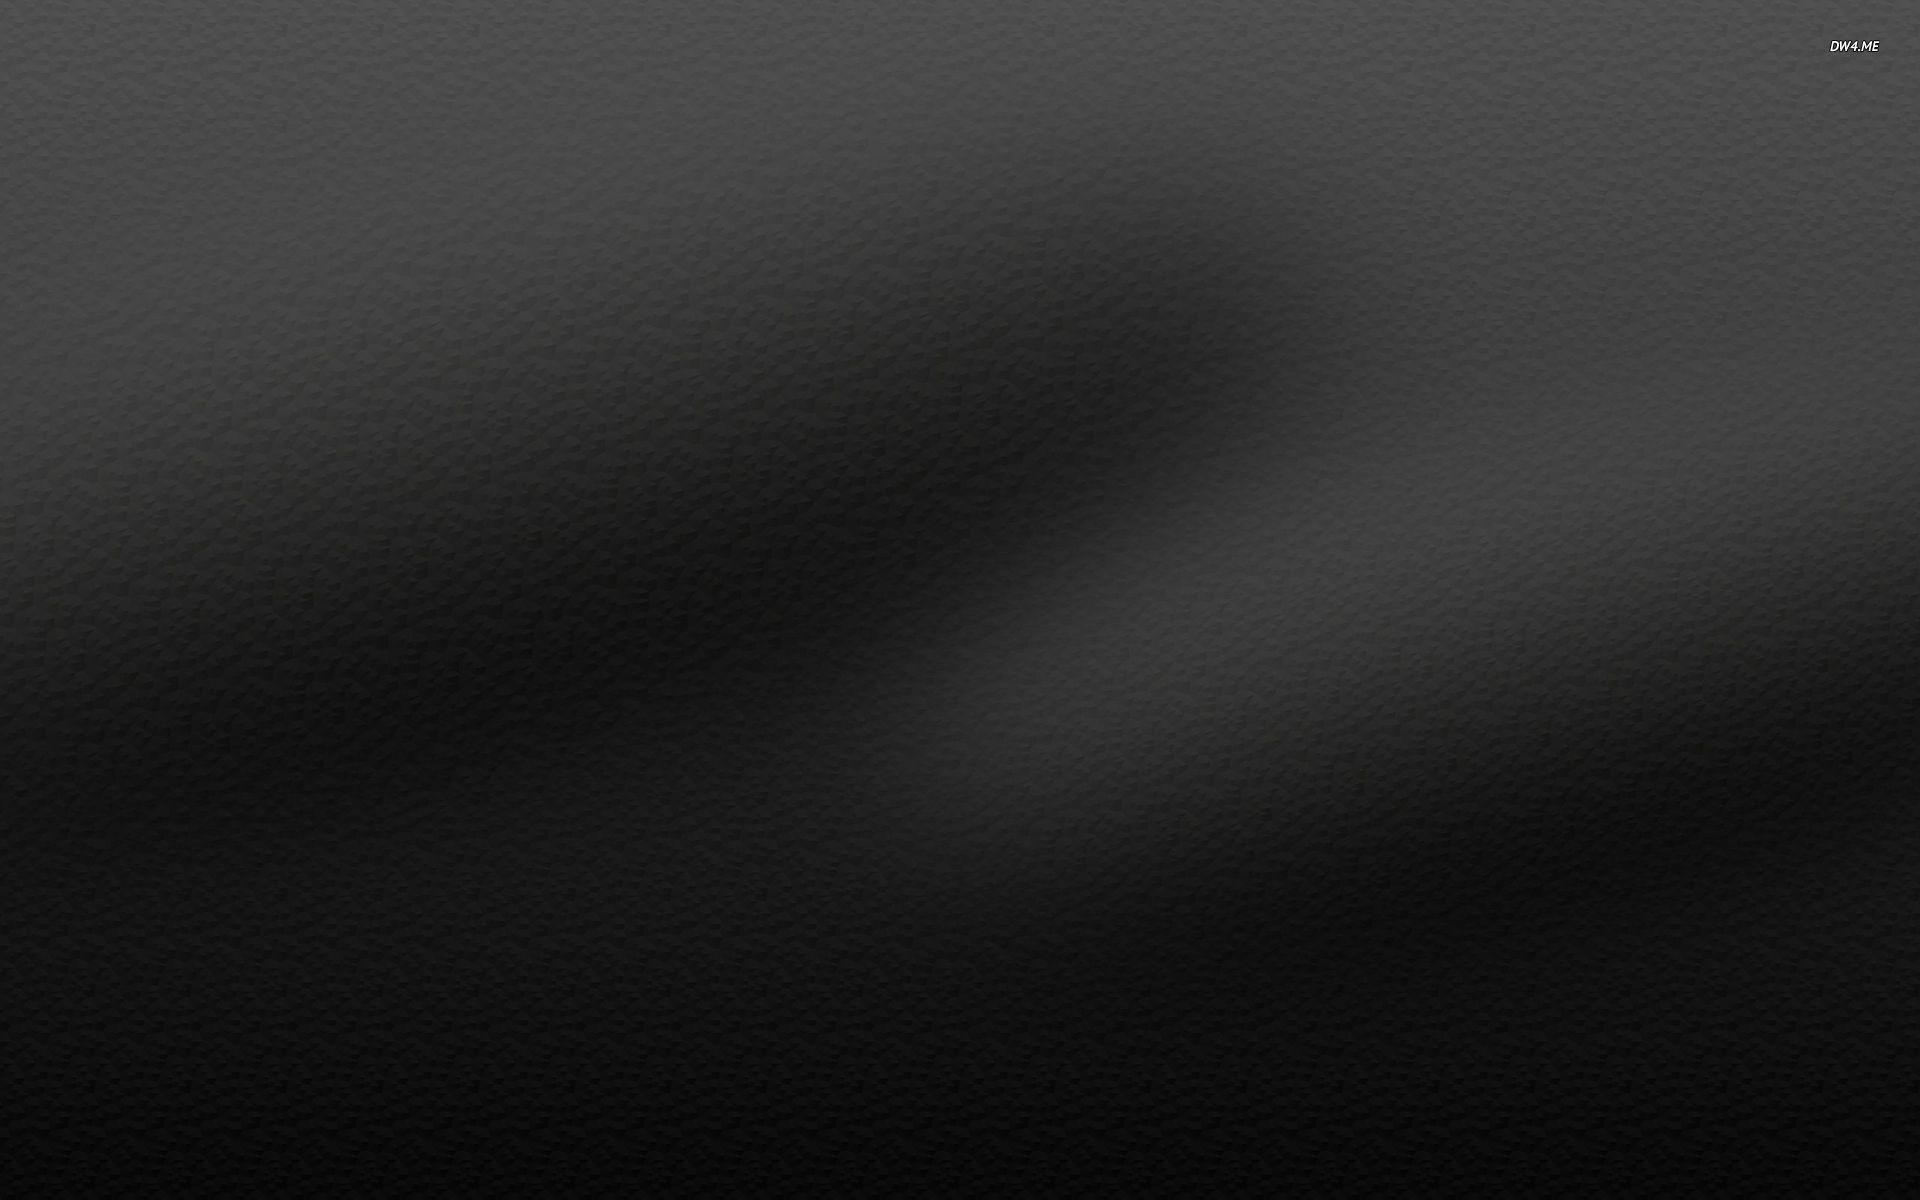 Glossy Black Wallpaper 1920x1200